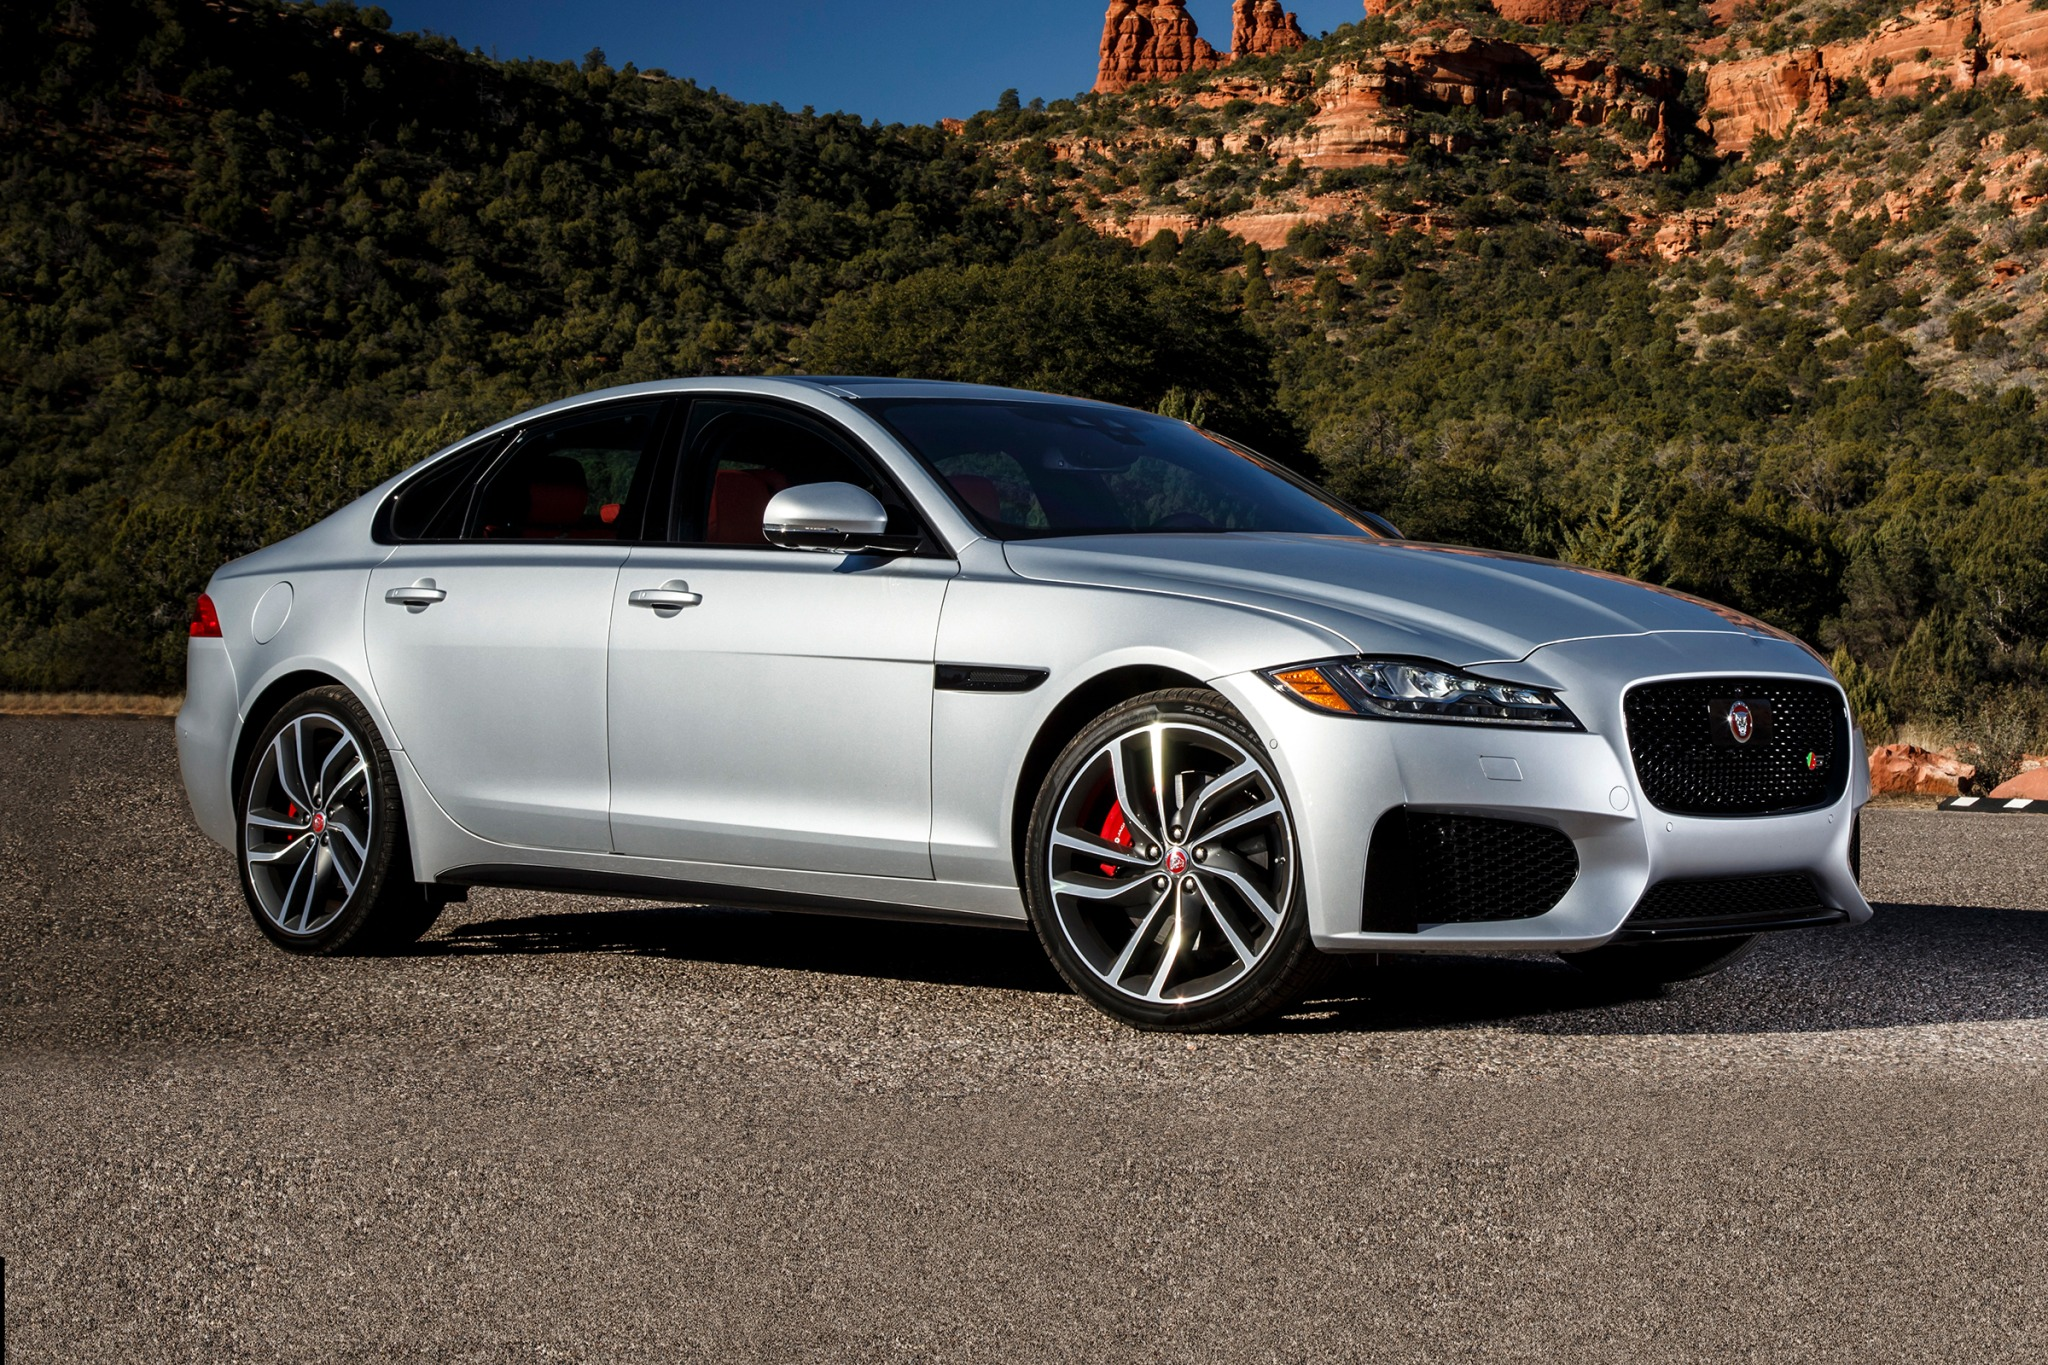 2016 jaguar xf sedan s fq oem 1 2048